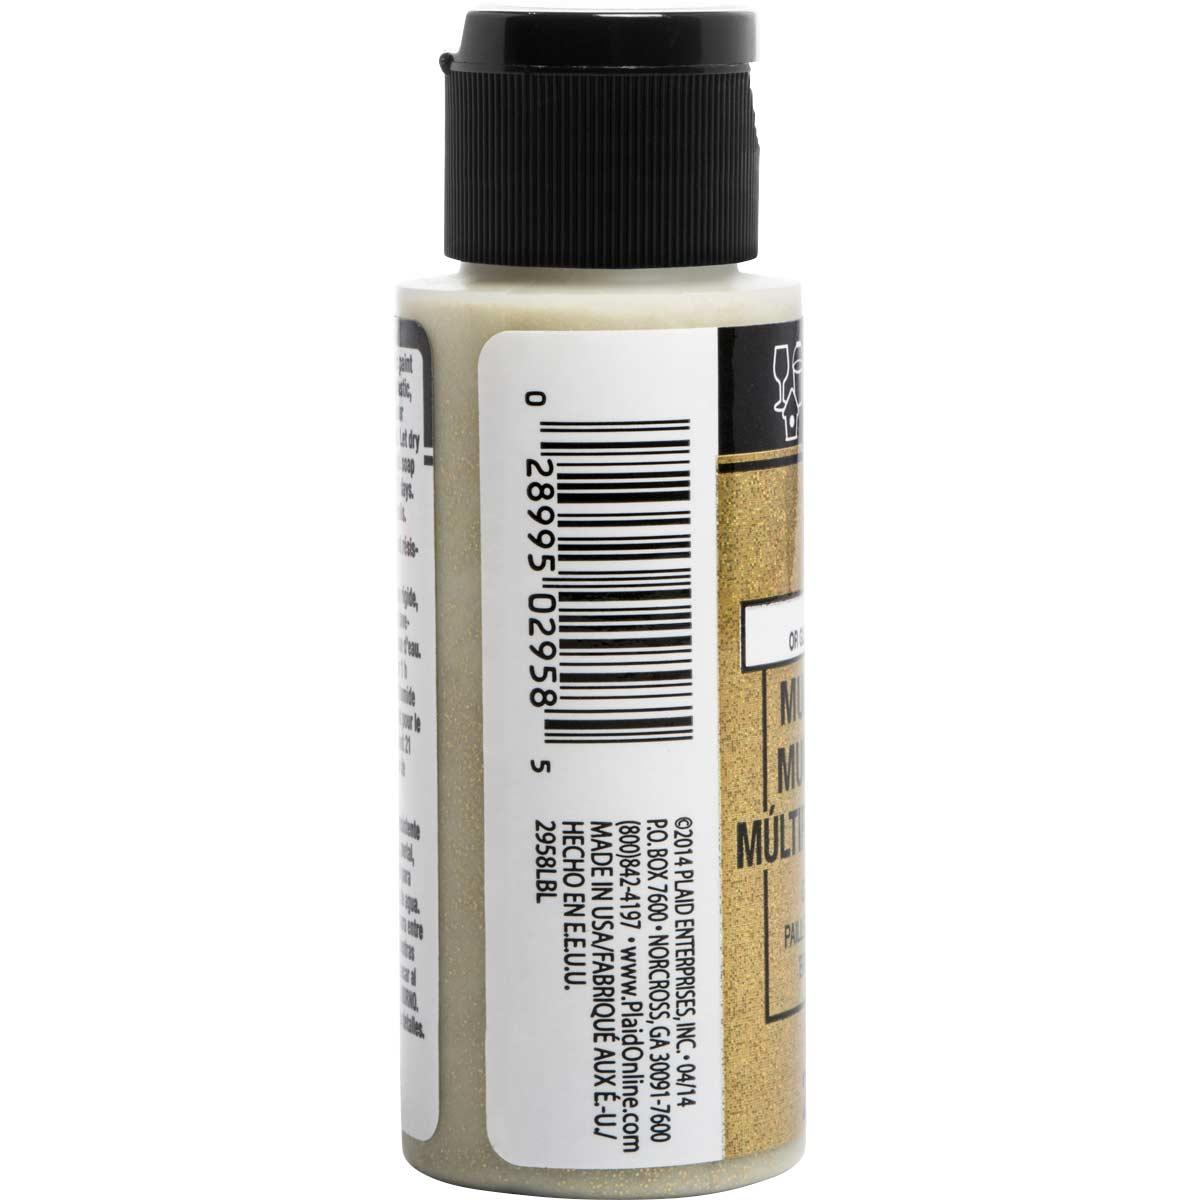 FolkArt ® Multi-Surface Glitter Acrylic Paints - Glam Gold, 2 oz.